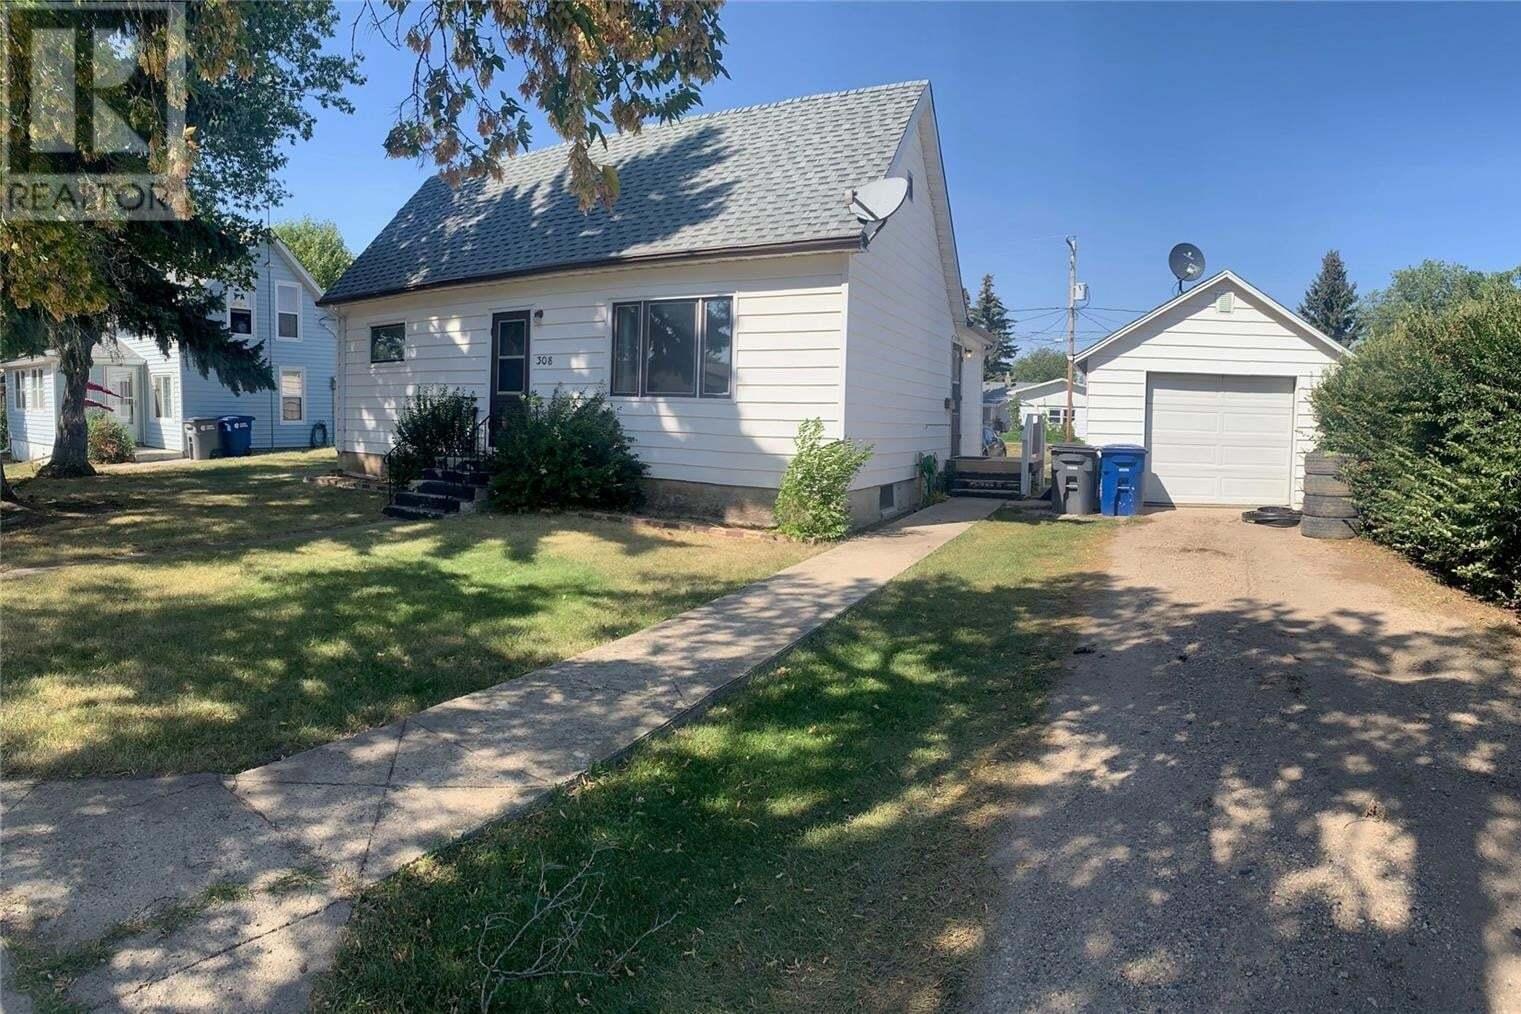 House for sale at 308 Pearson St Strasbourg Saskatchewan - MLS: SK824123